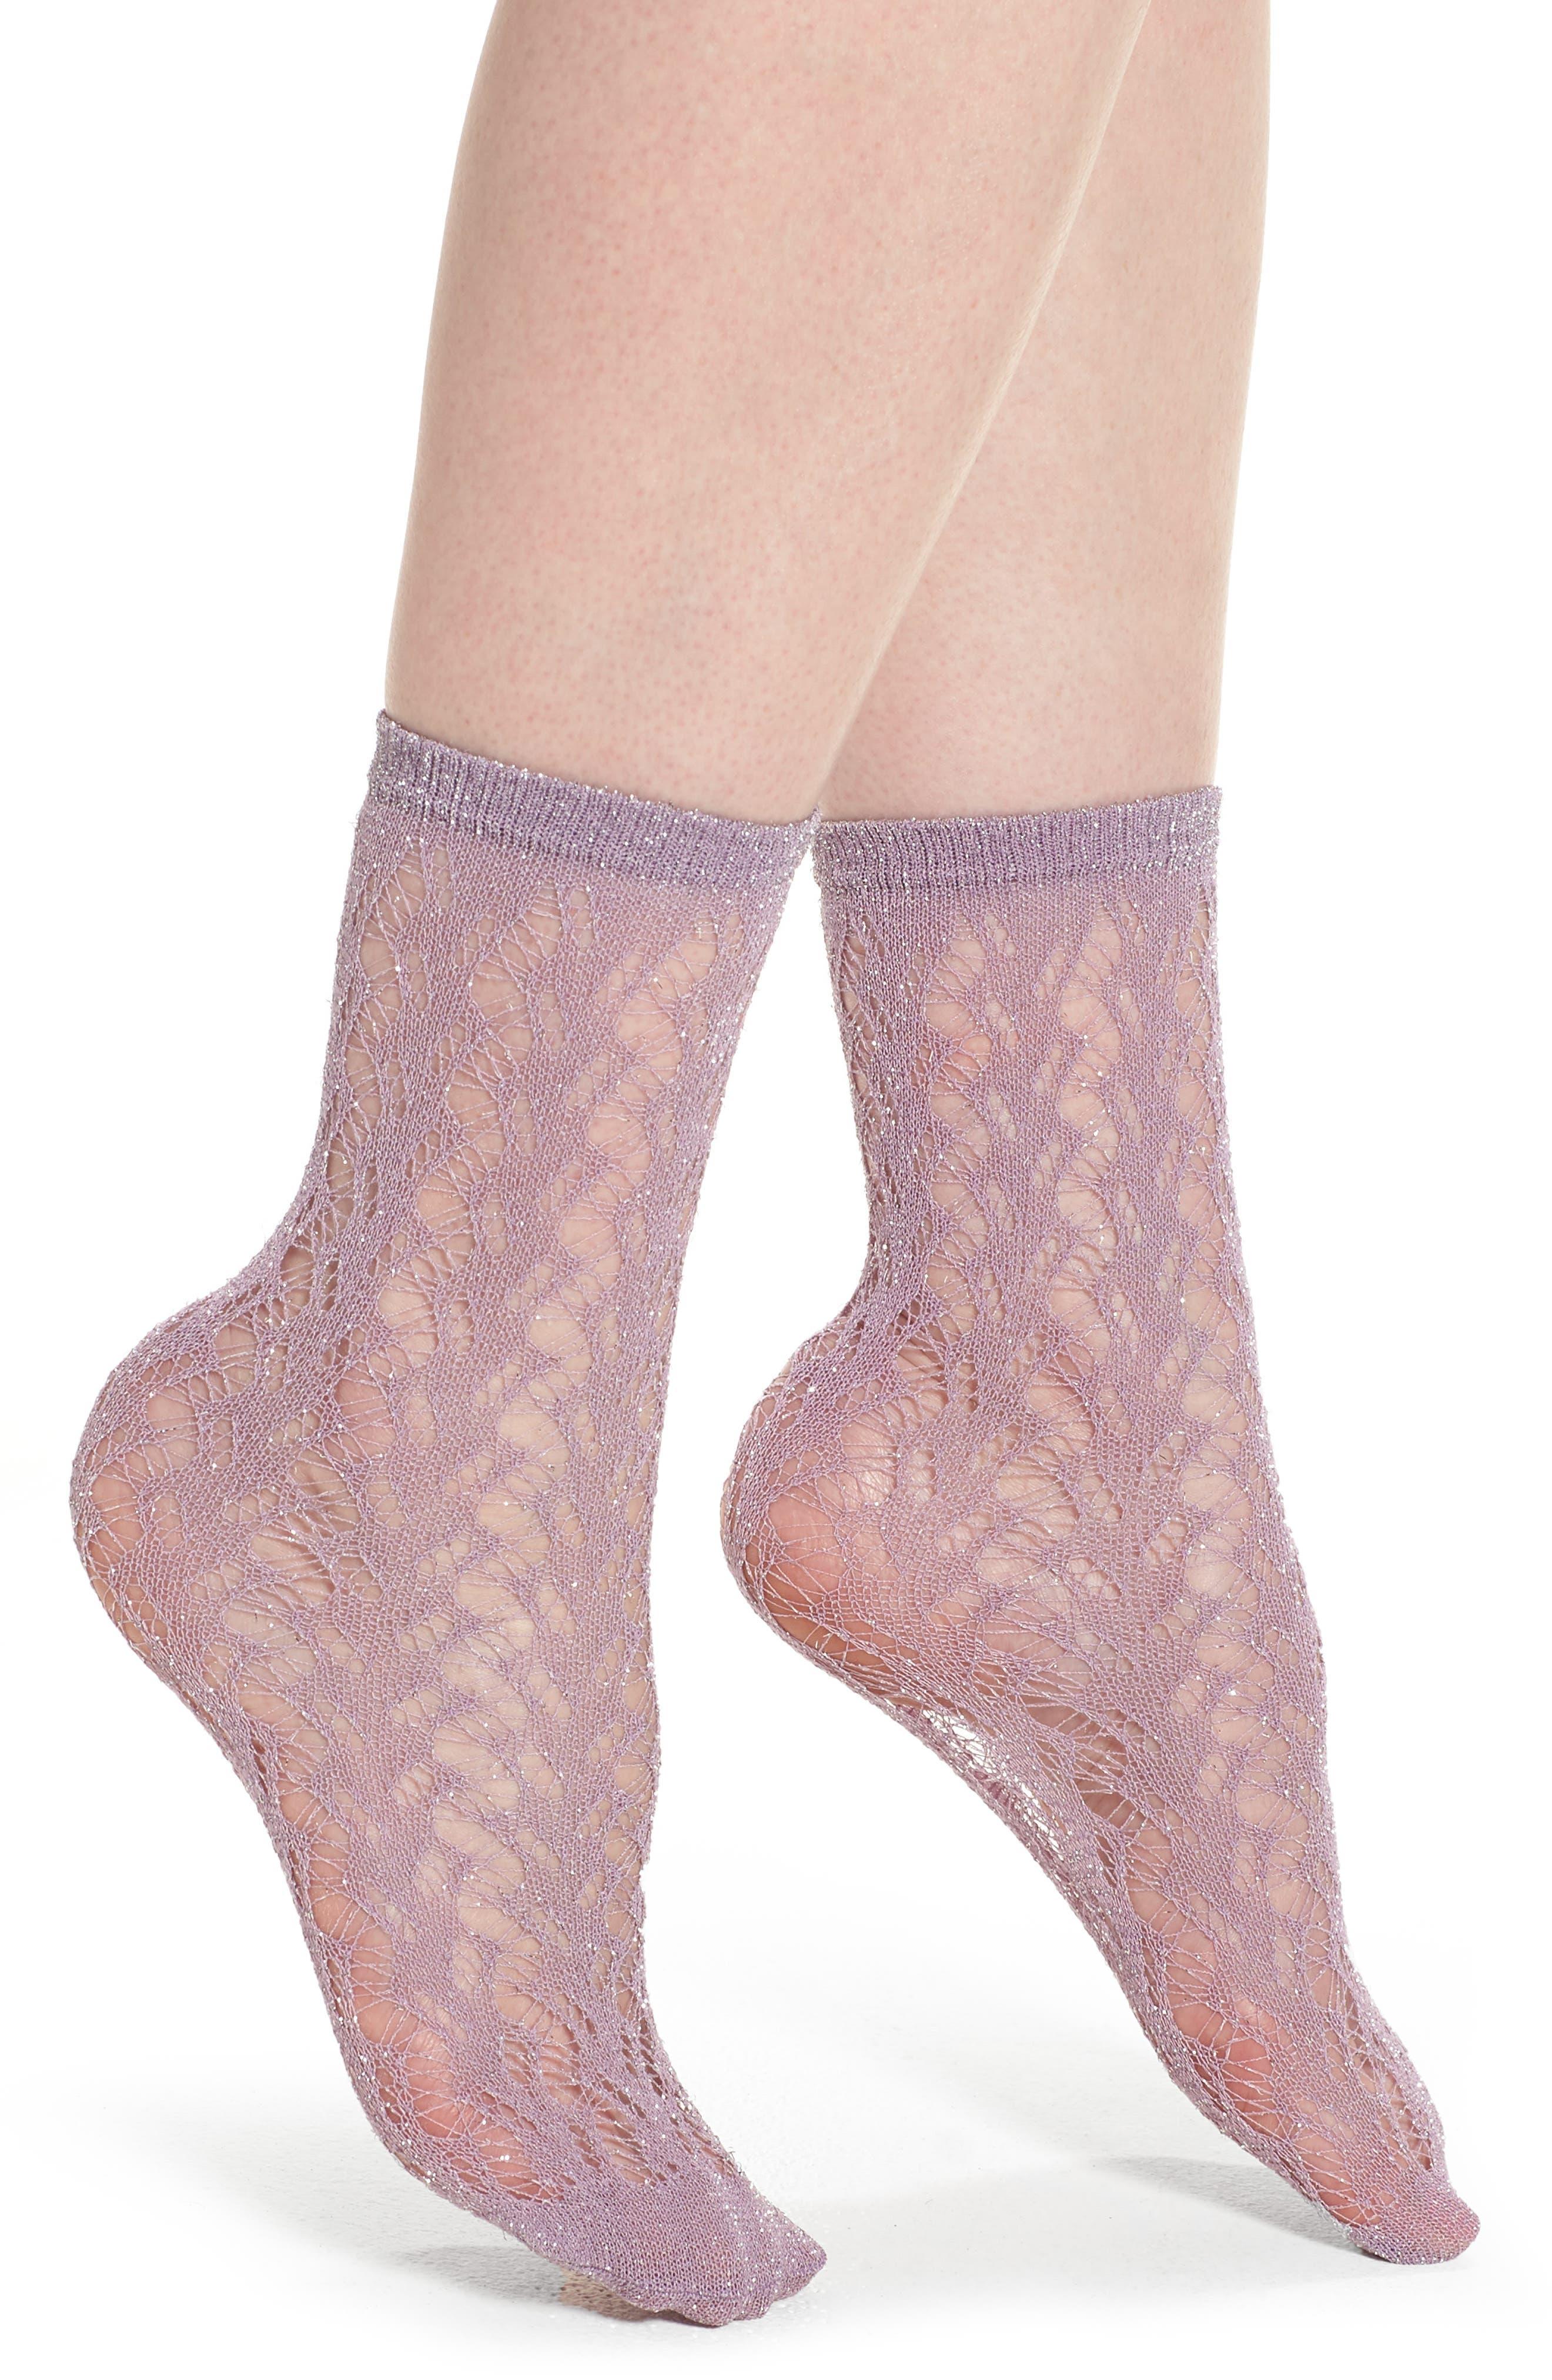 Calzino Glitter Fishnet Trouser Socks,                             Main thumbnail 2, color,